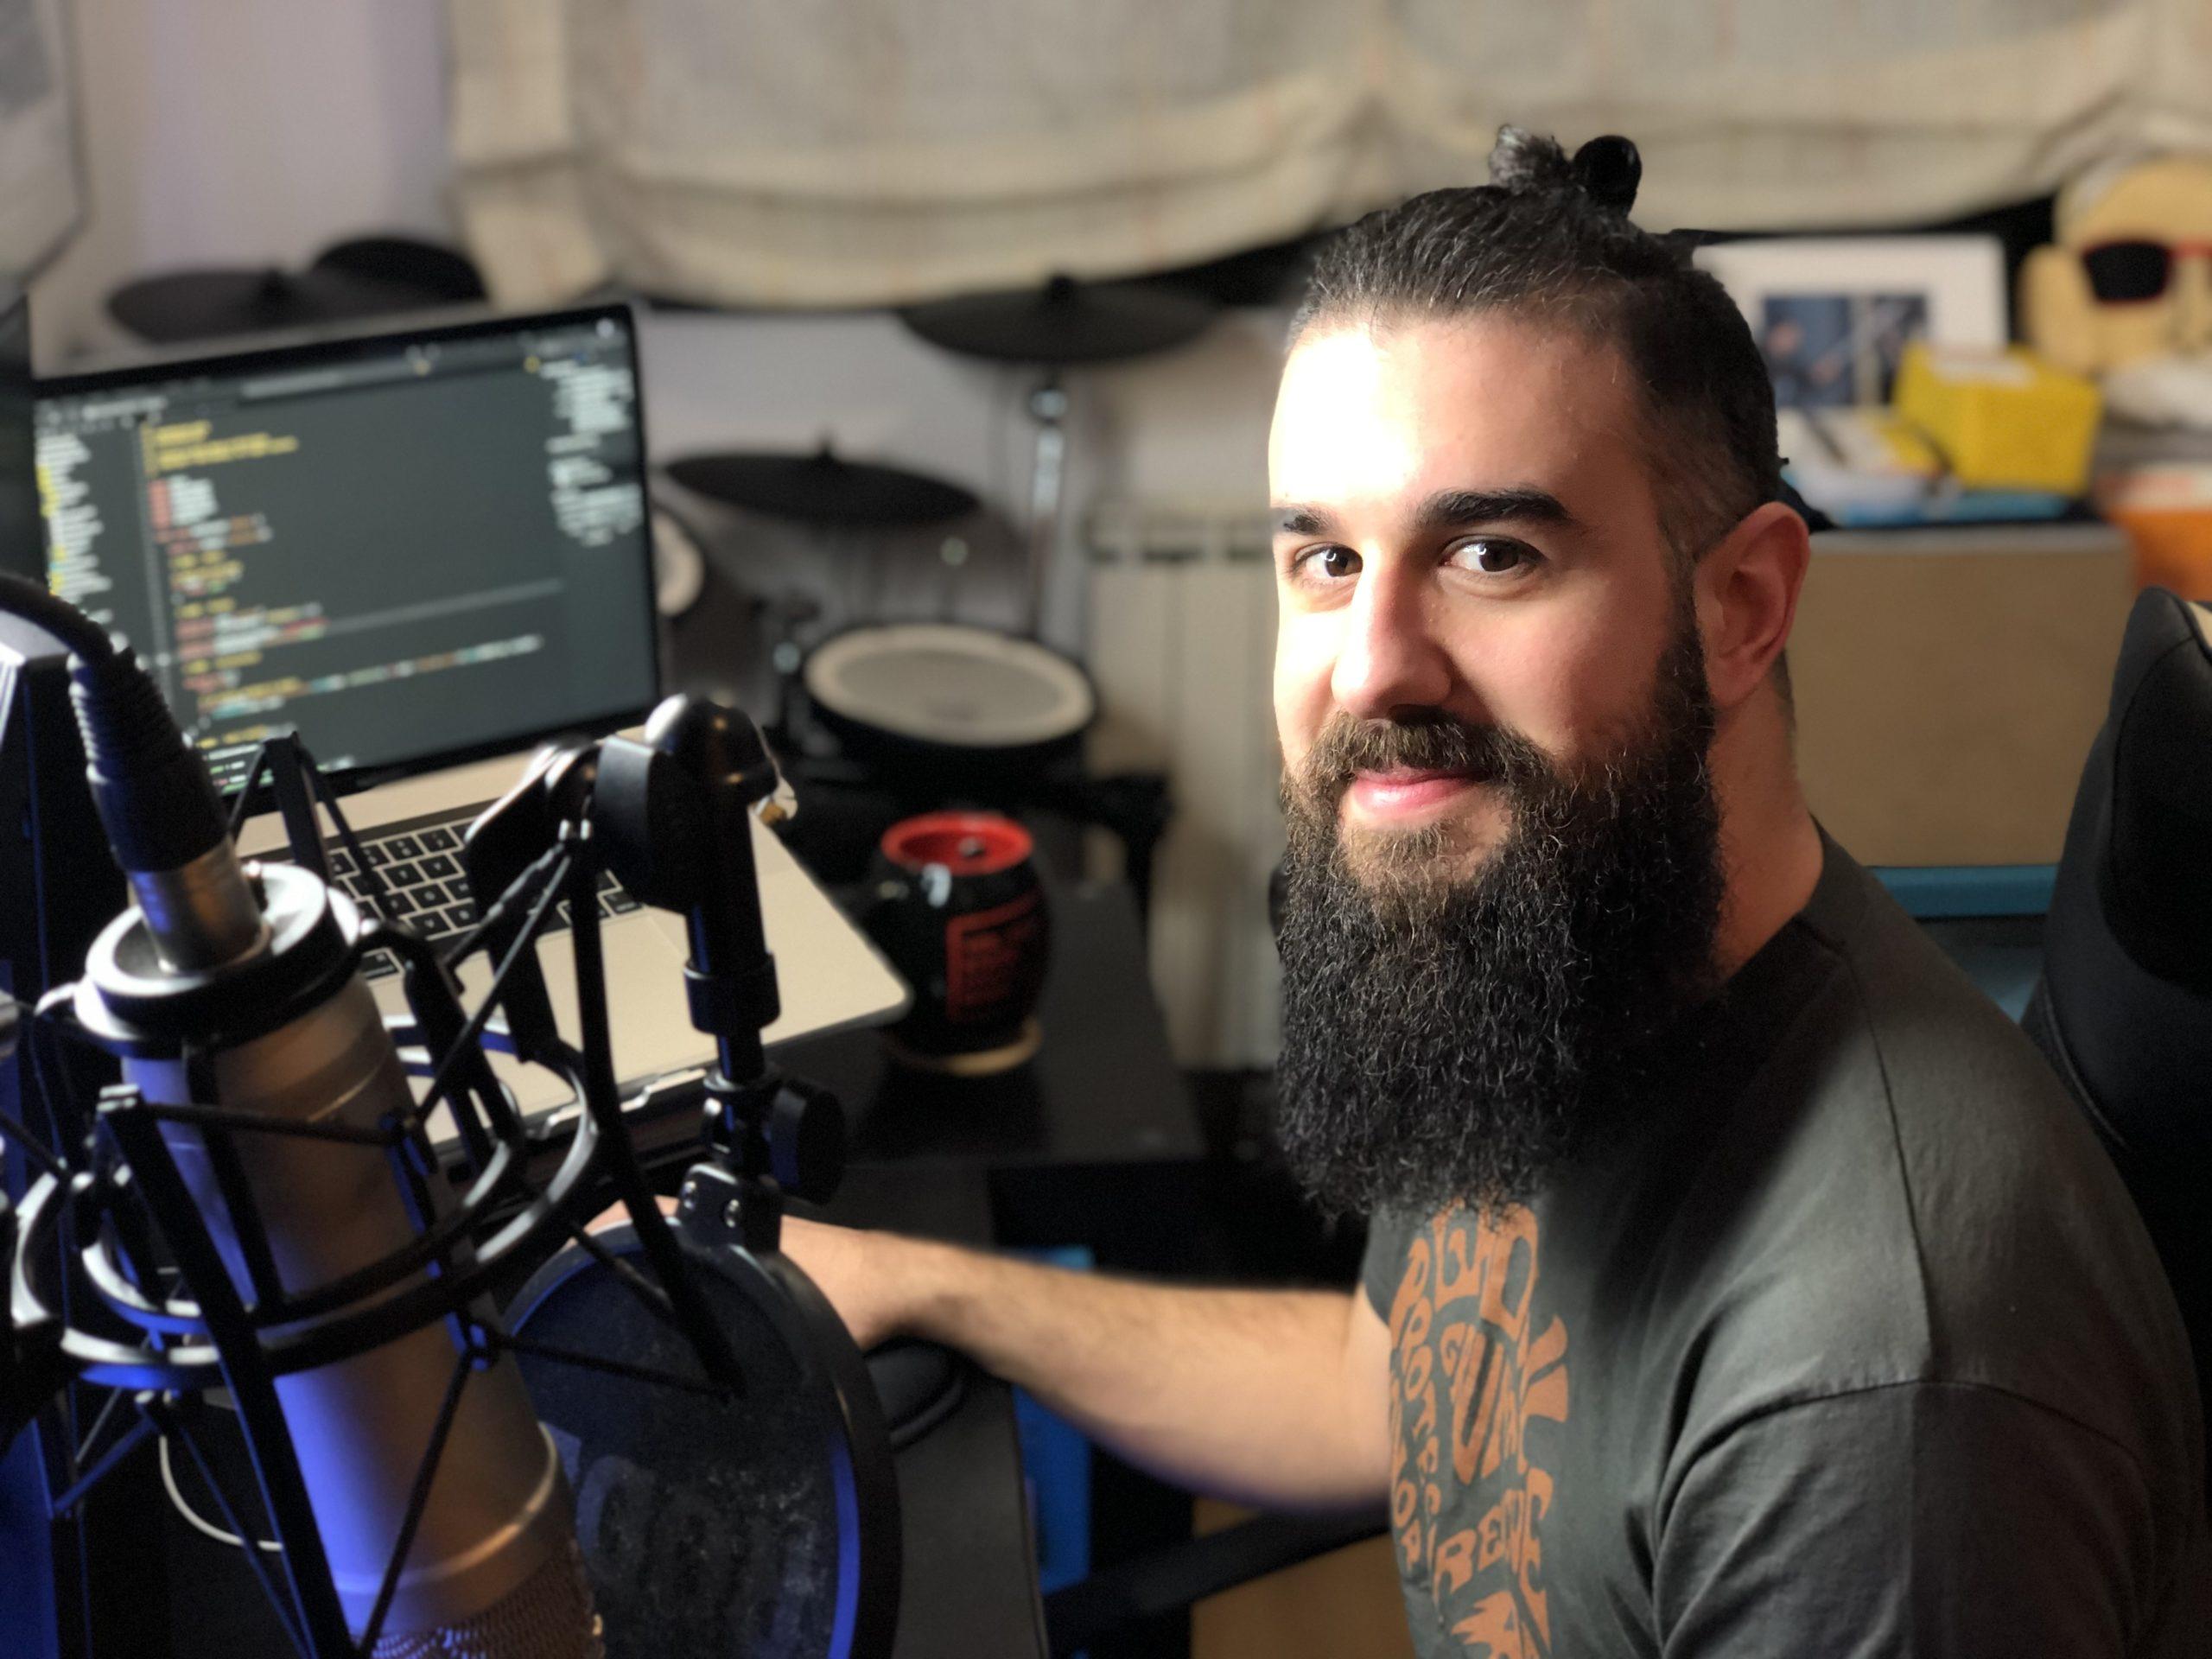 Cómo llegar a ser desarrollador mobile freelance con Brais Moure